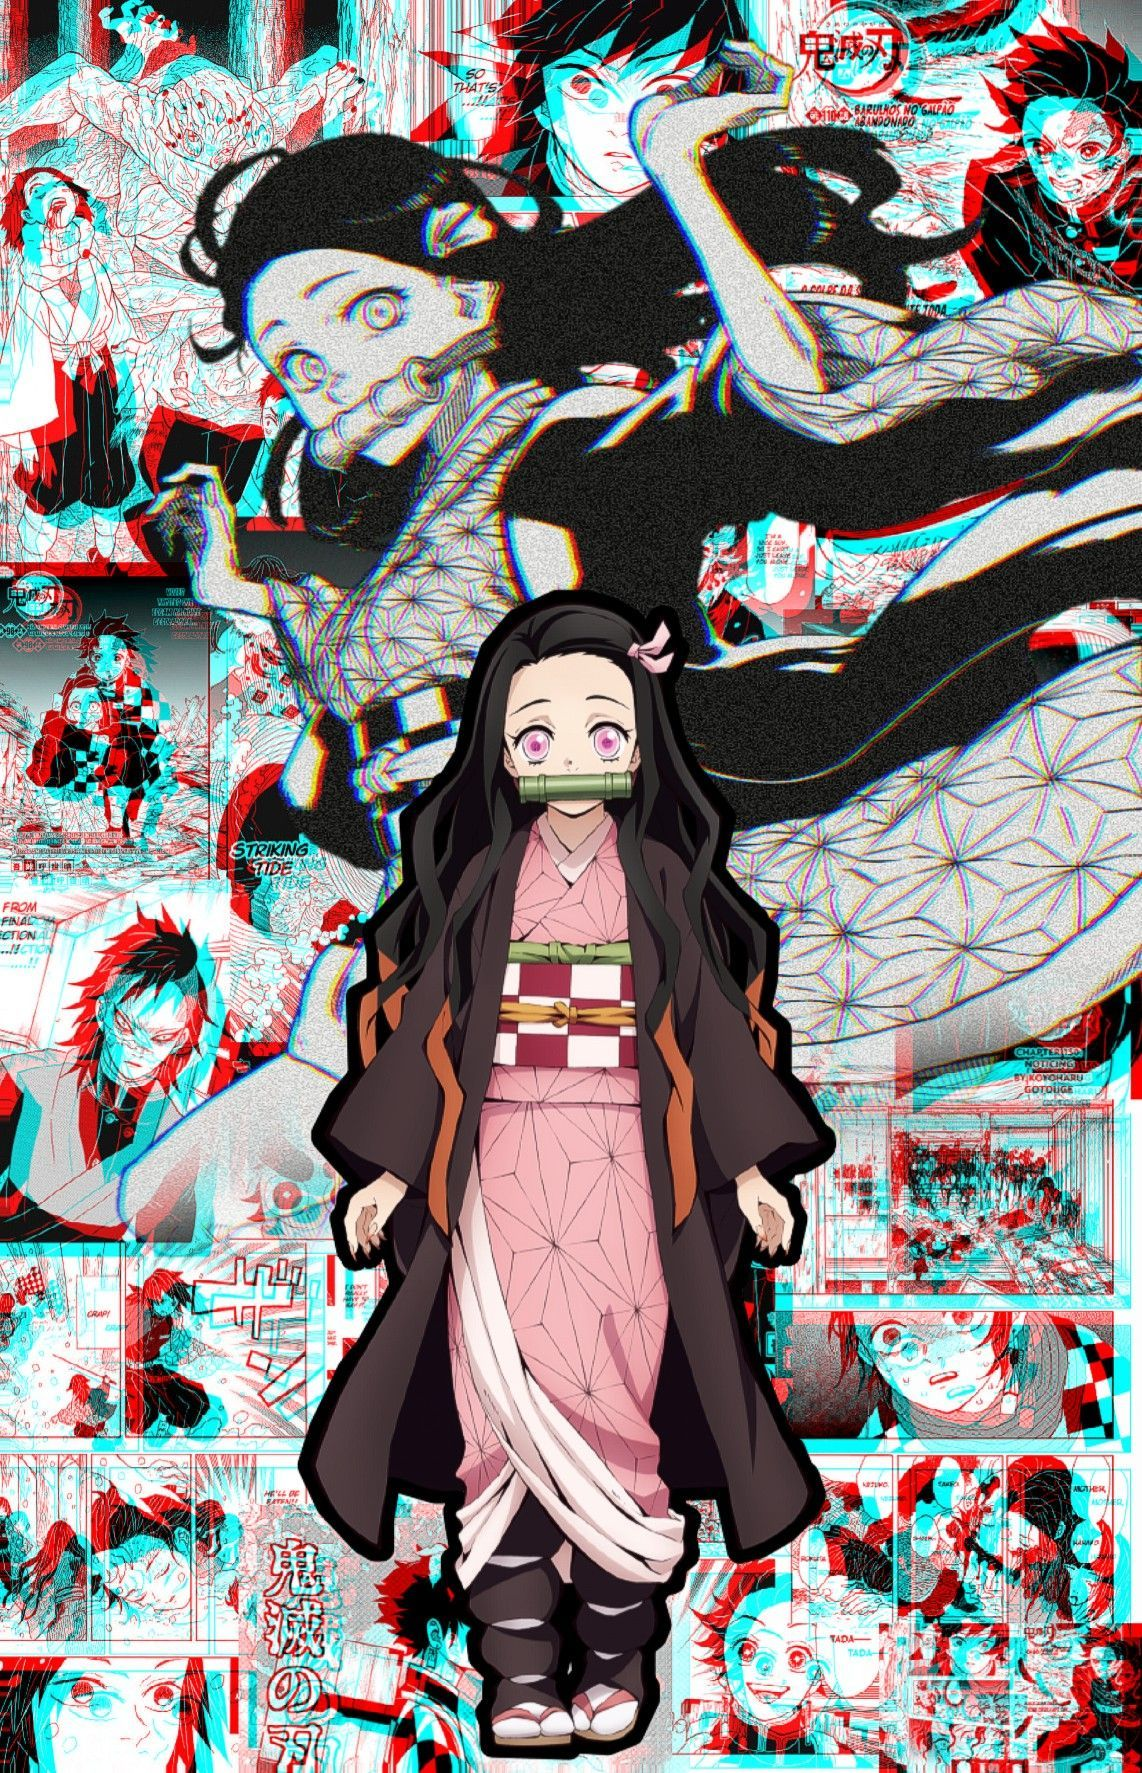 Kimetsu No Yaiba Wallpaper Hd For Pc Anime Wallpaper Iphone